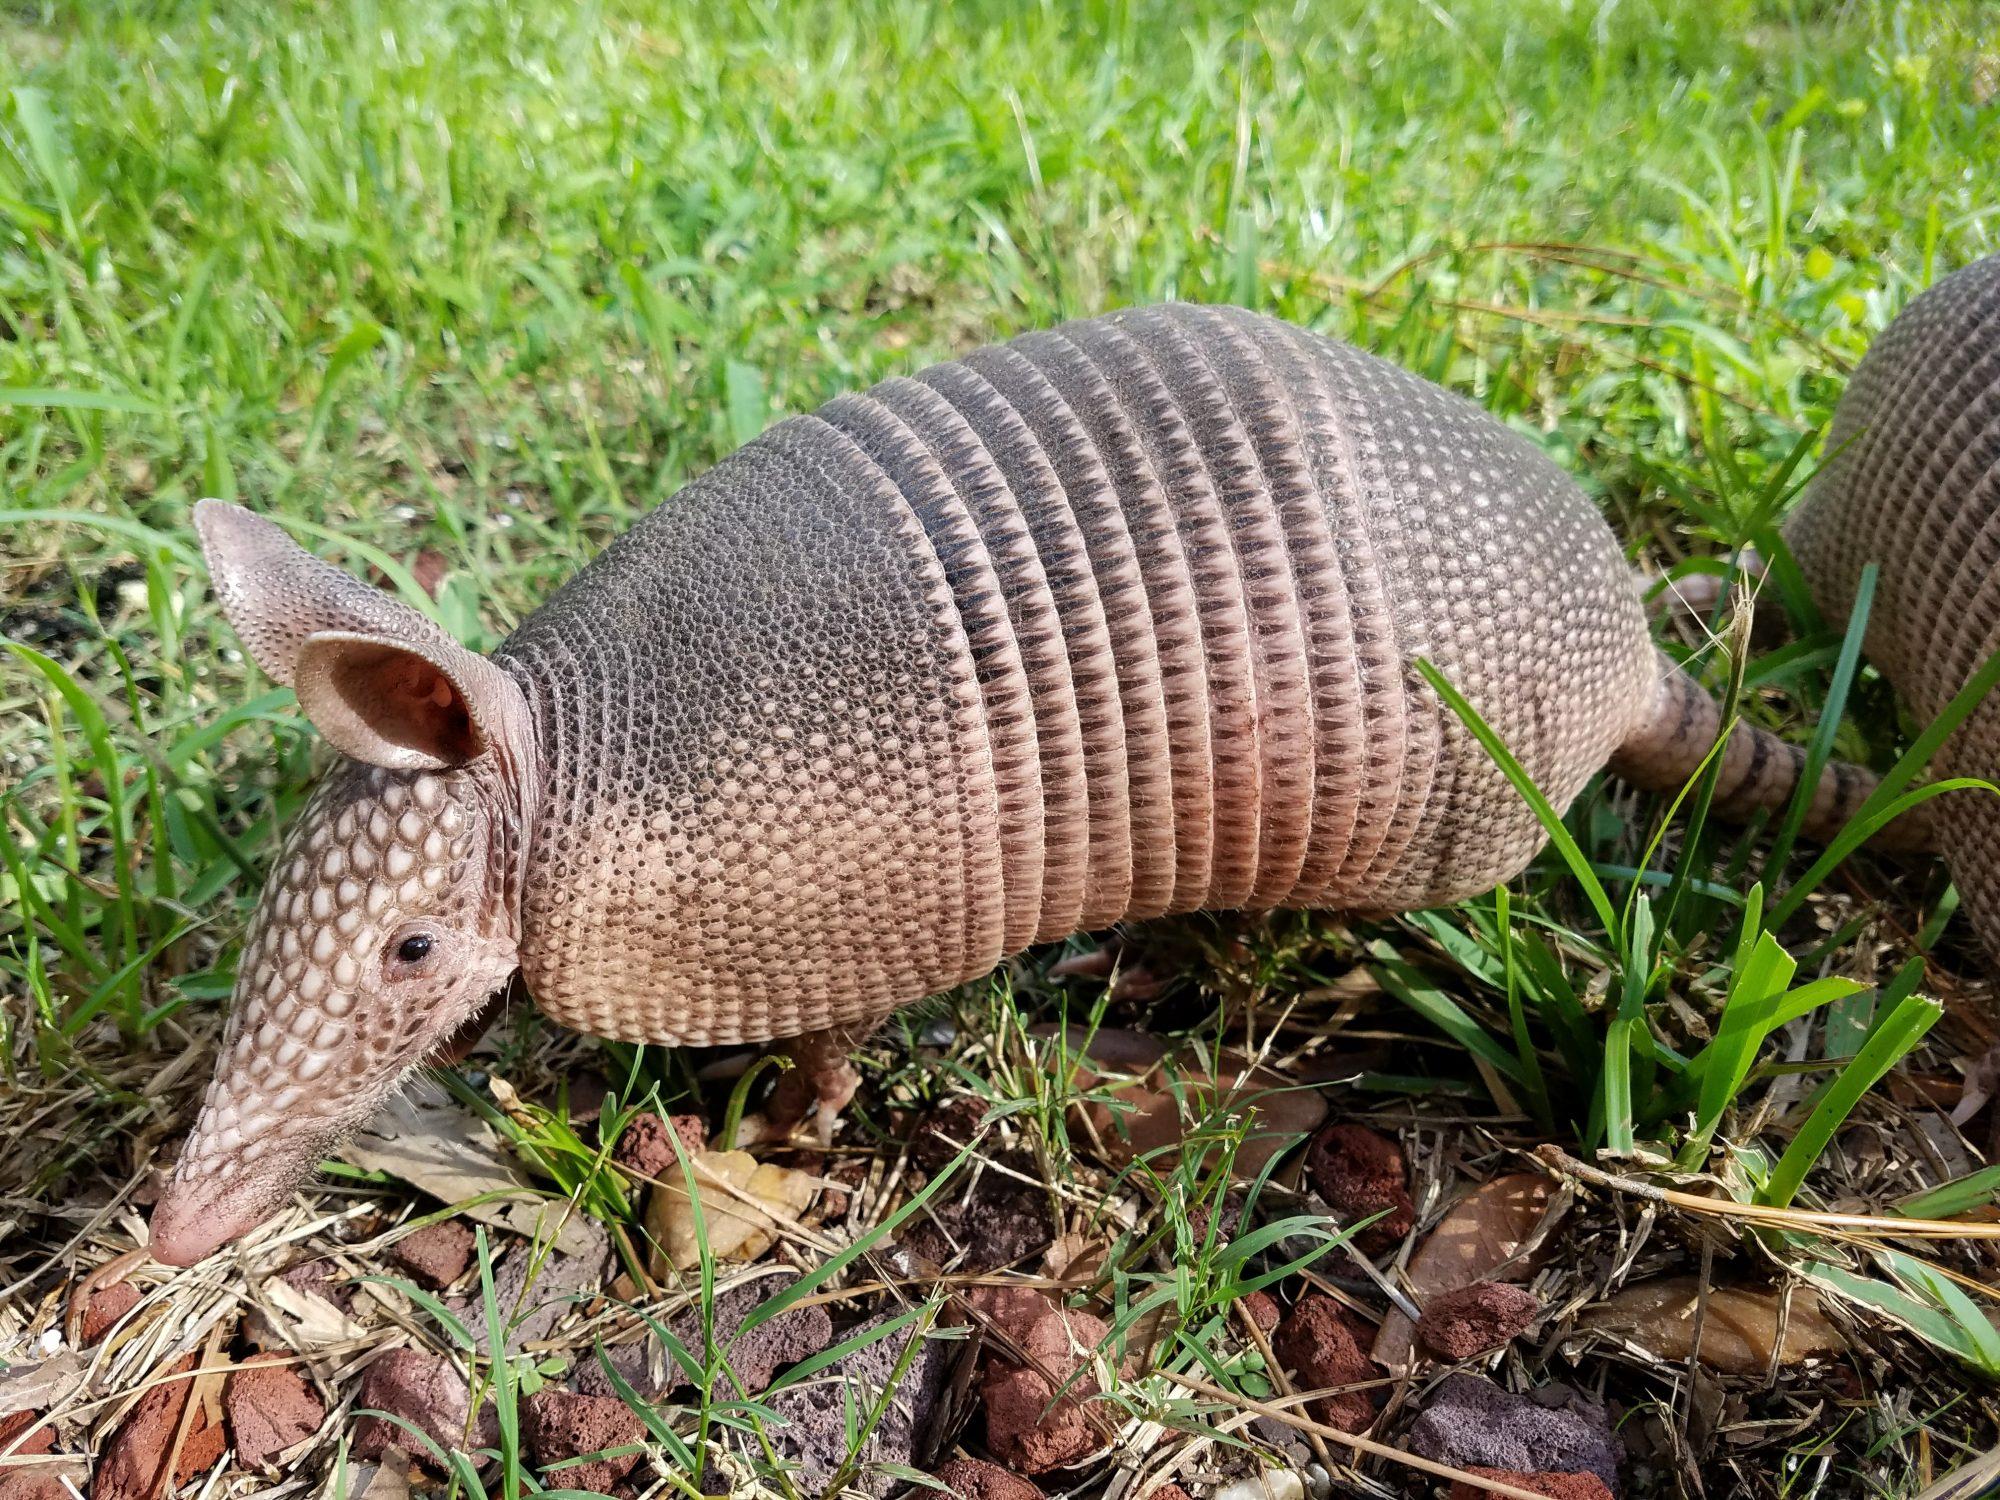 How To Get Rid Of A Possum In Your Garage ways to discourage wildlife in your yard | dfw wildlife